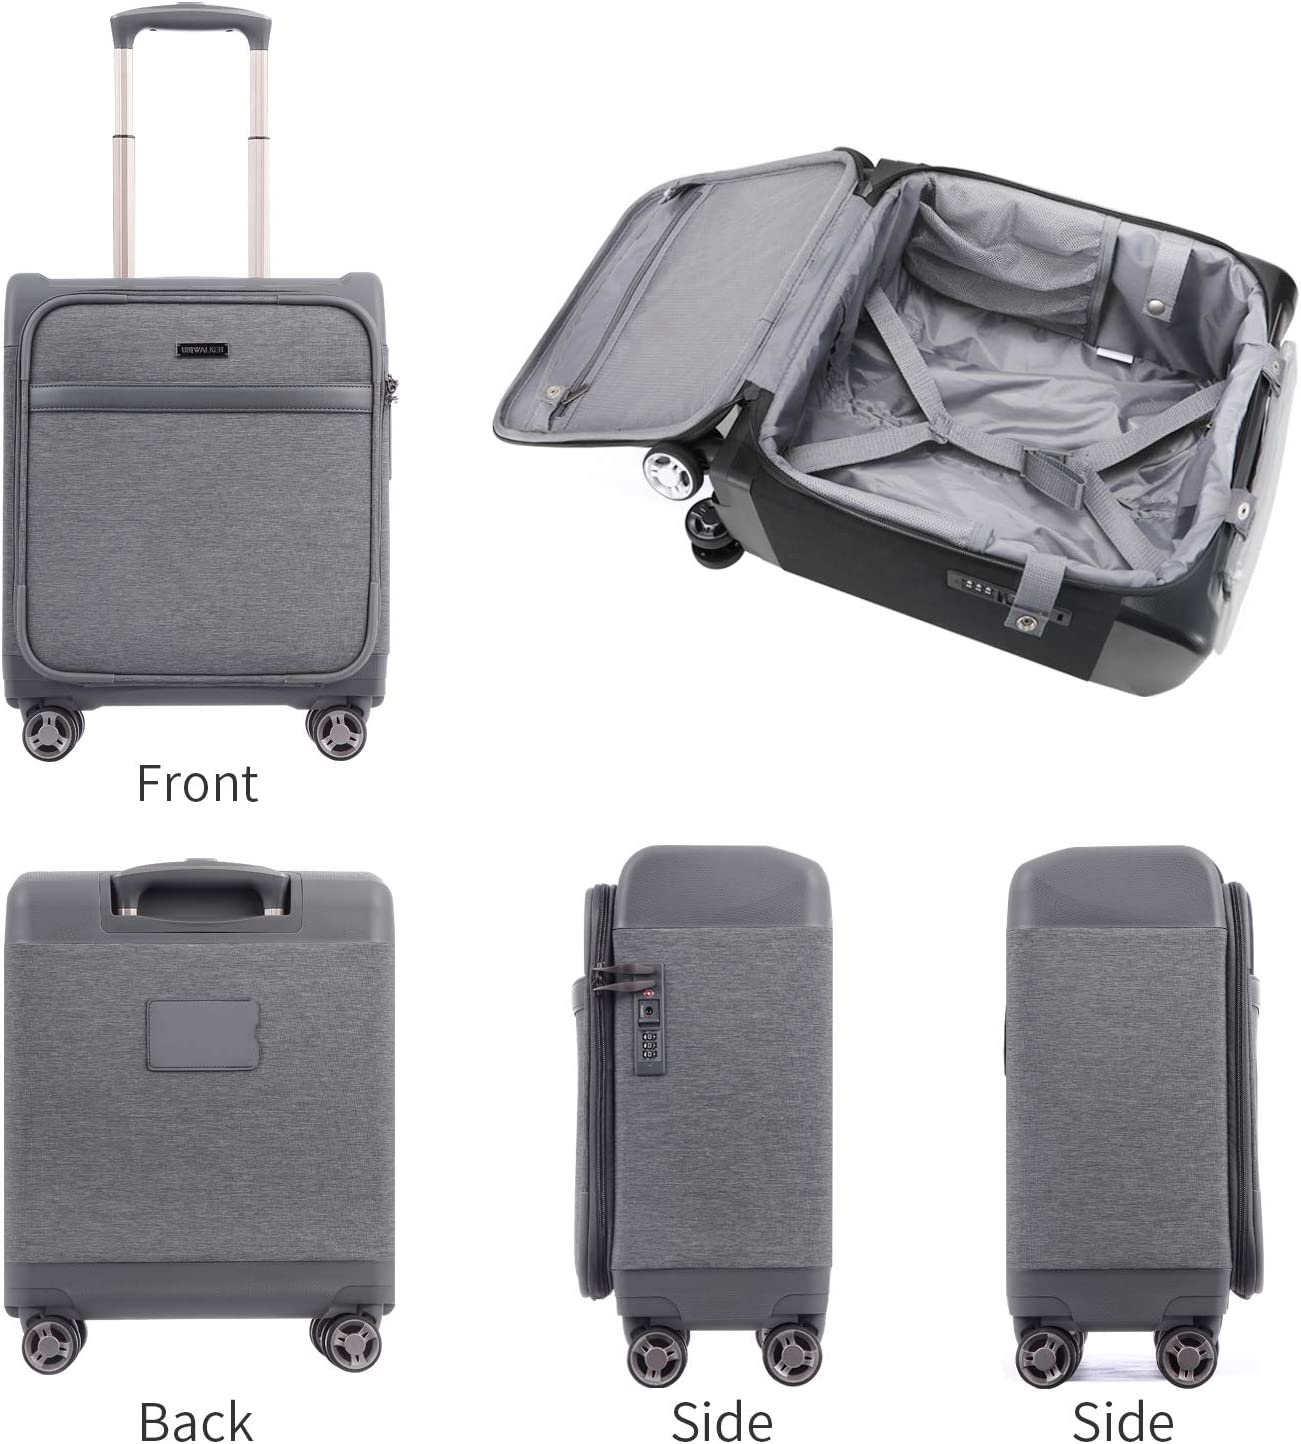 Unitravel Lightweight Carry-on Suitcase Softside Spinner Underseat Luggage with TSA Lock